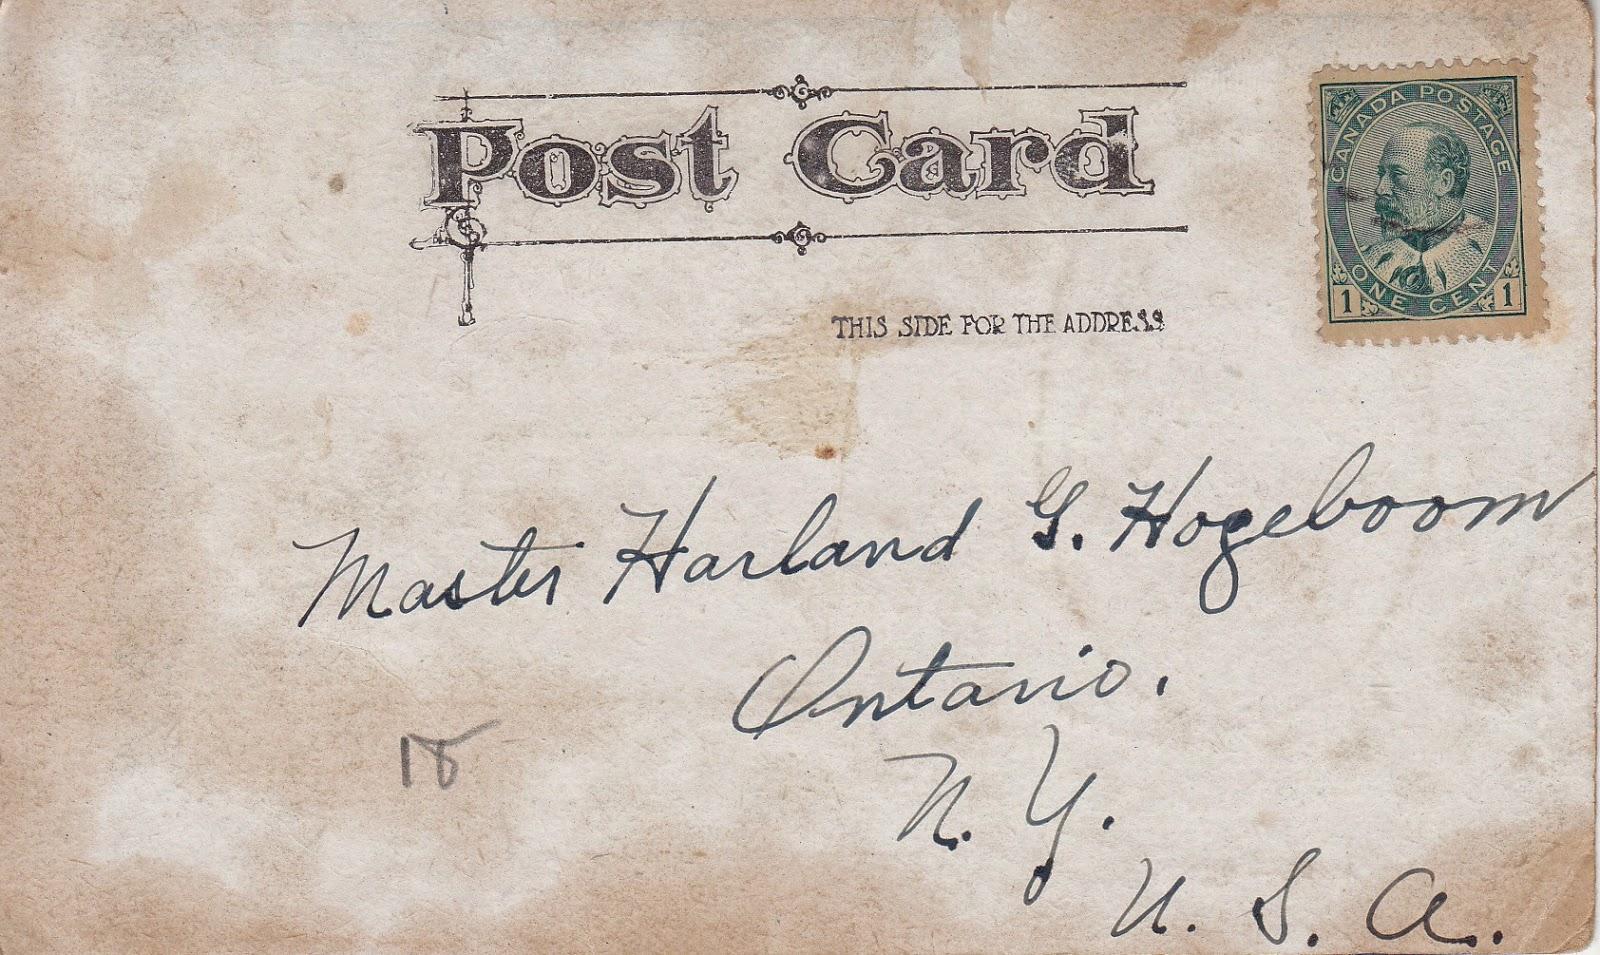 Bank of Cupid Vintage Postcard - pay 1,000,000 kisses